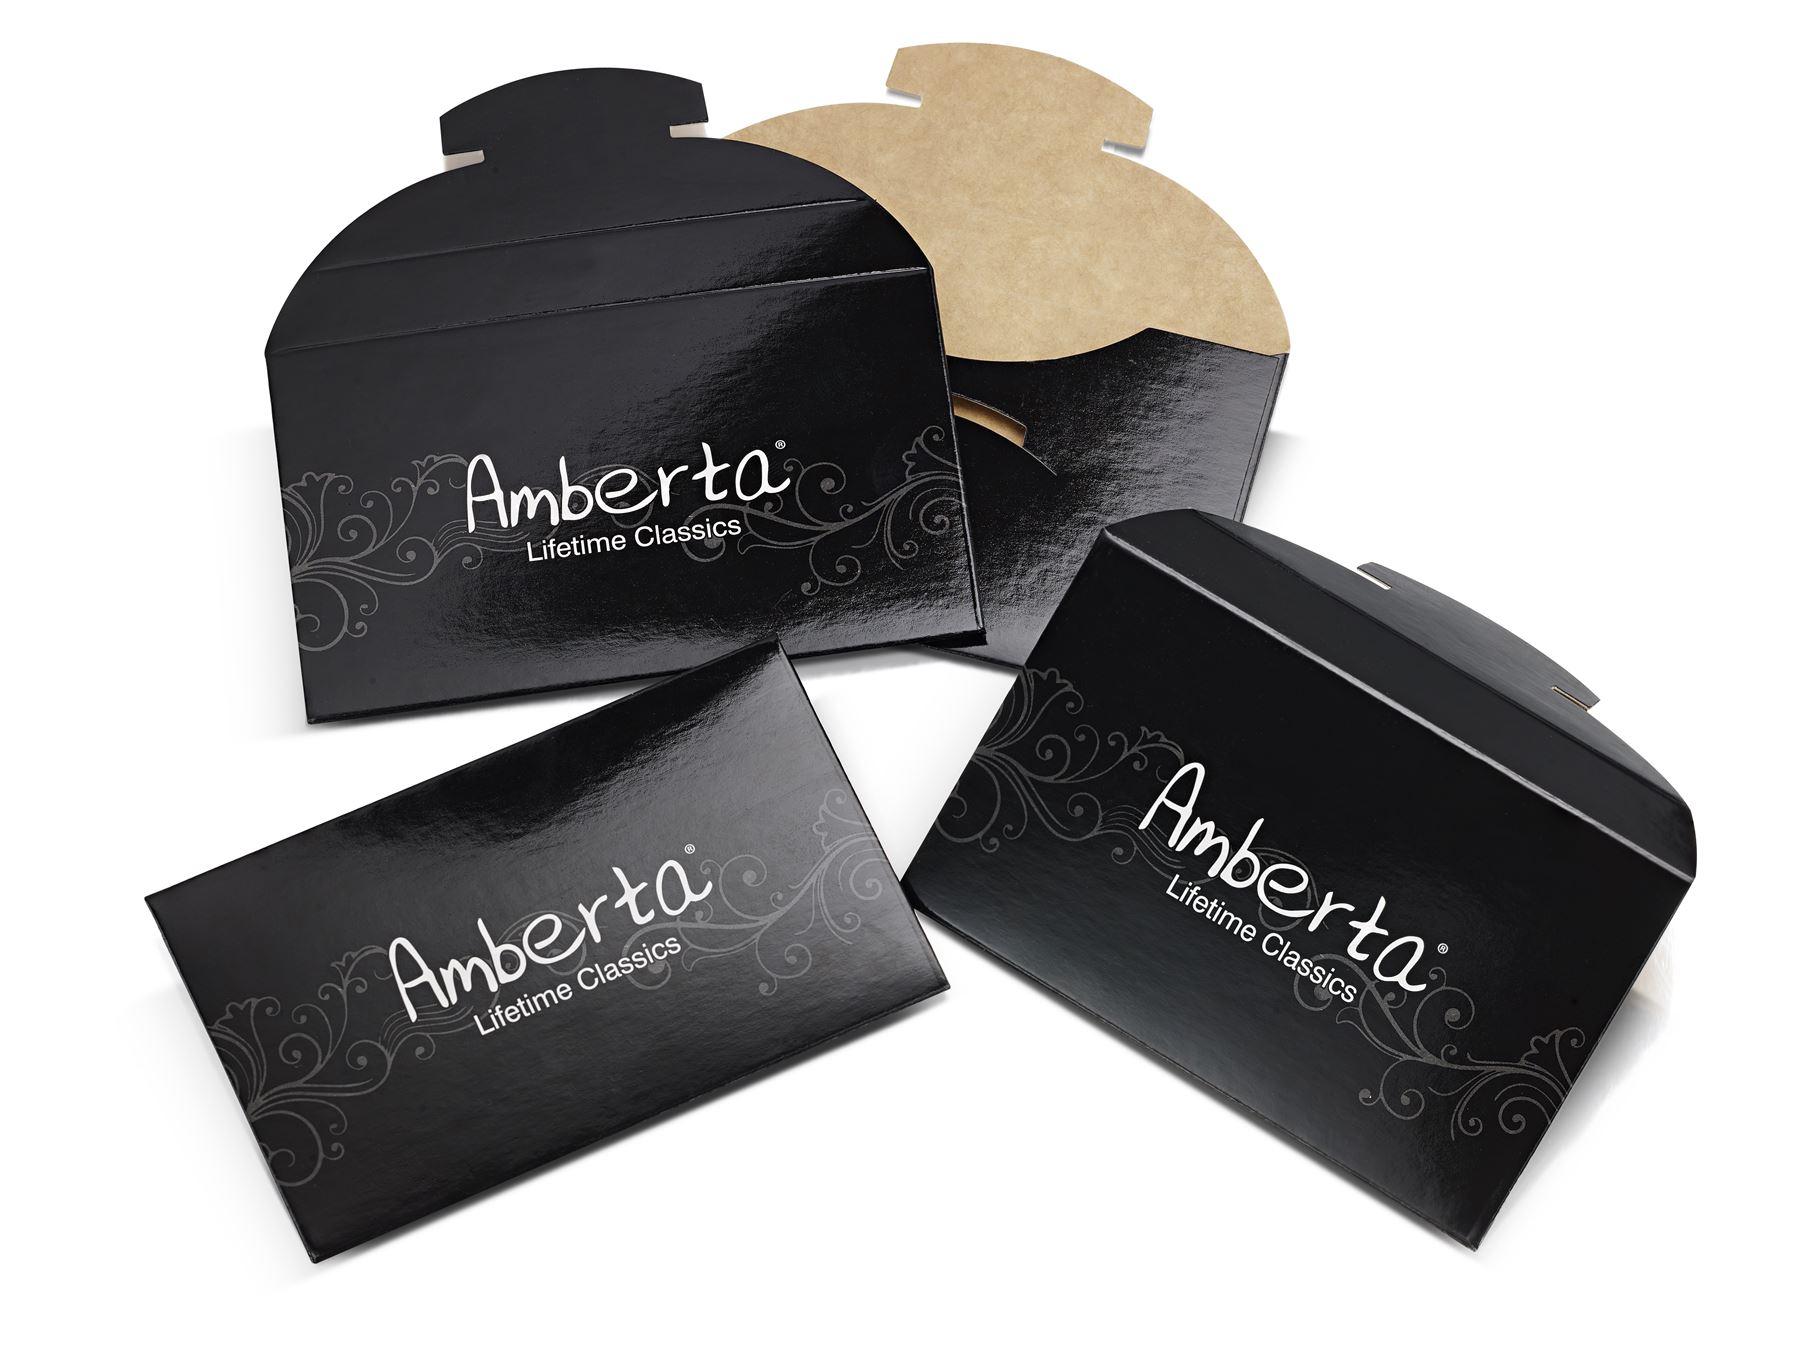 Amberta-Jewelry-925-Sterling-Silver-Adjustable-Bracelet-Italian-Bangle-for-Women miniature 79